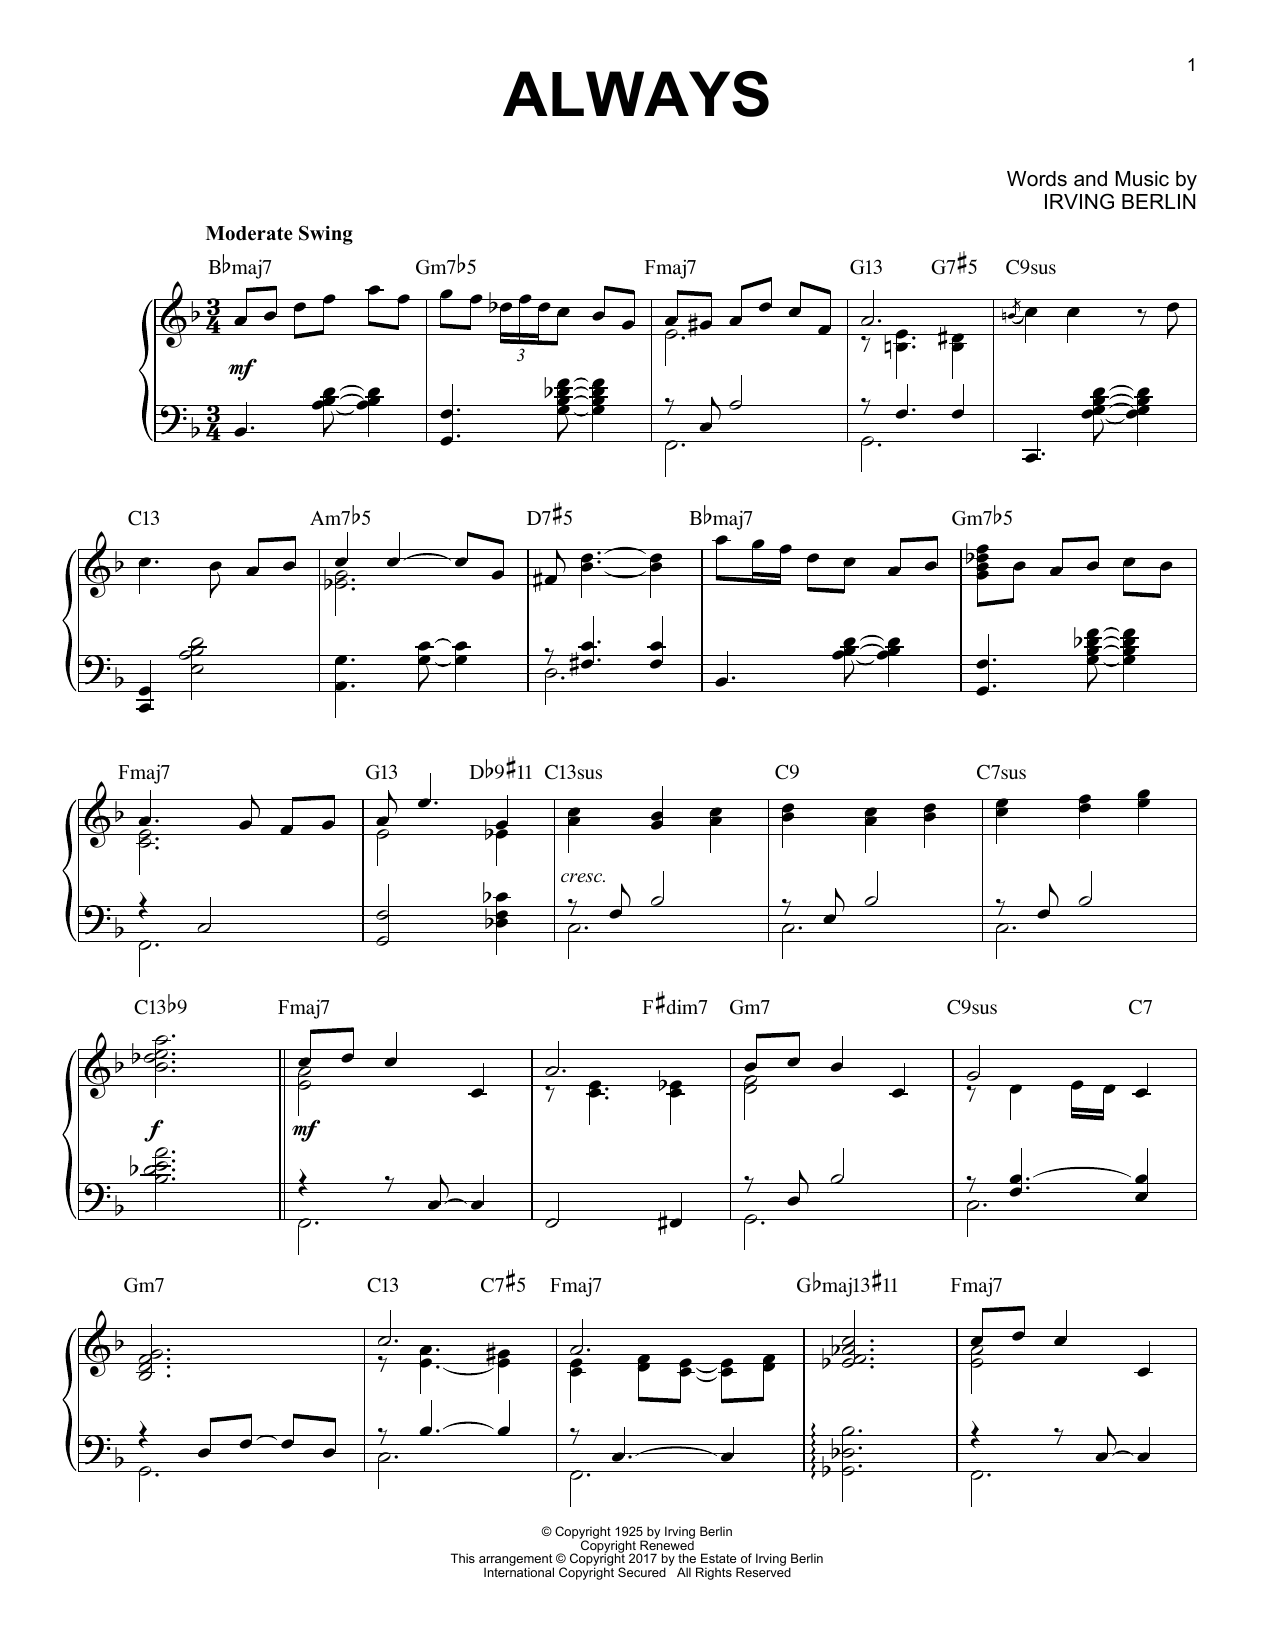 Irving Berlin Always [Jazz version] sheet music notes and chords. Download Printable PDF.